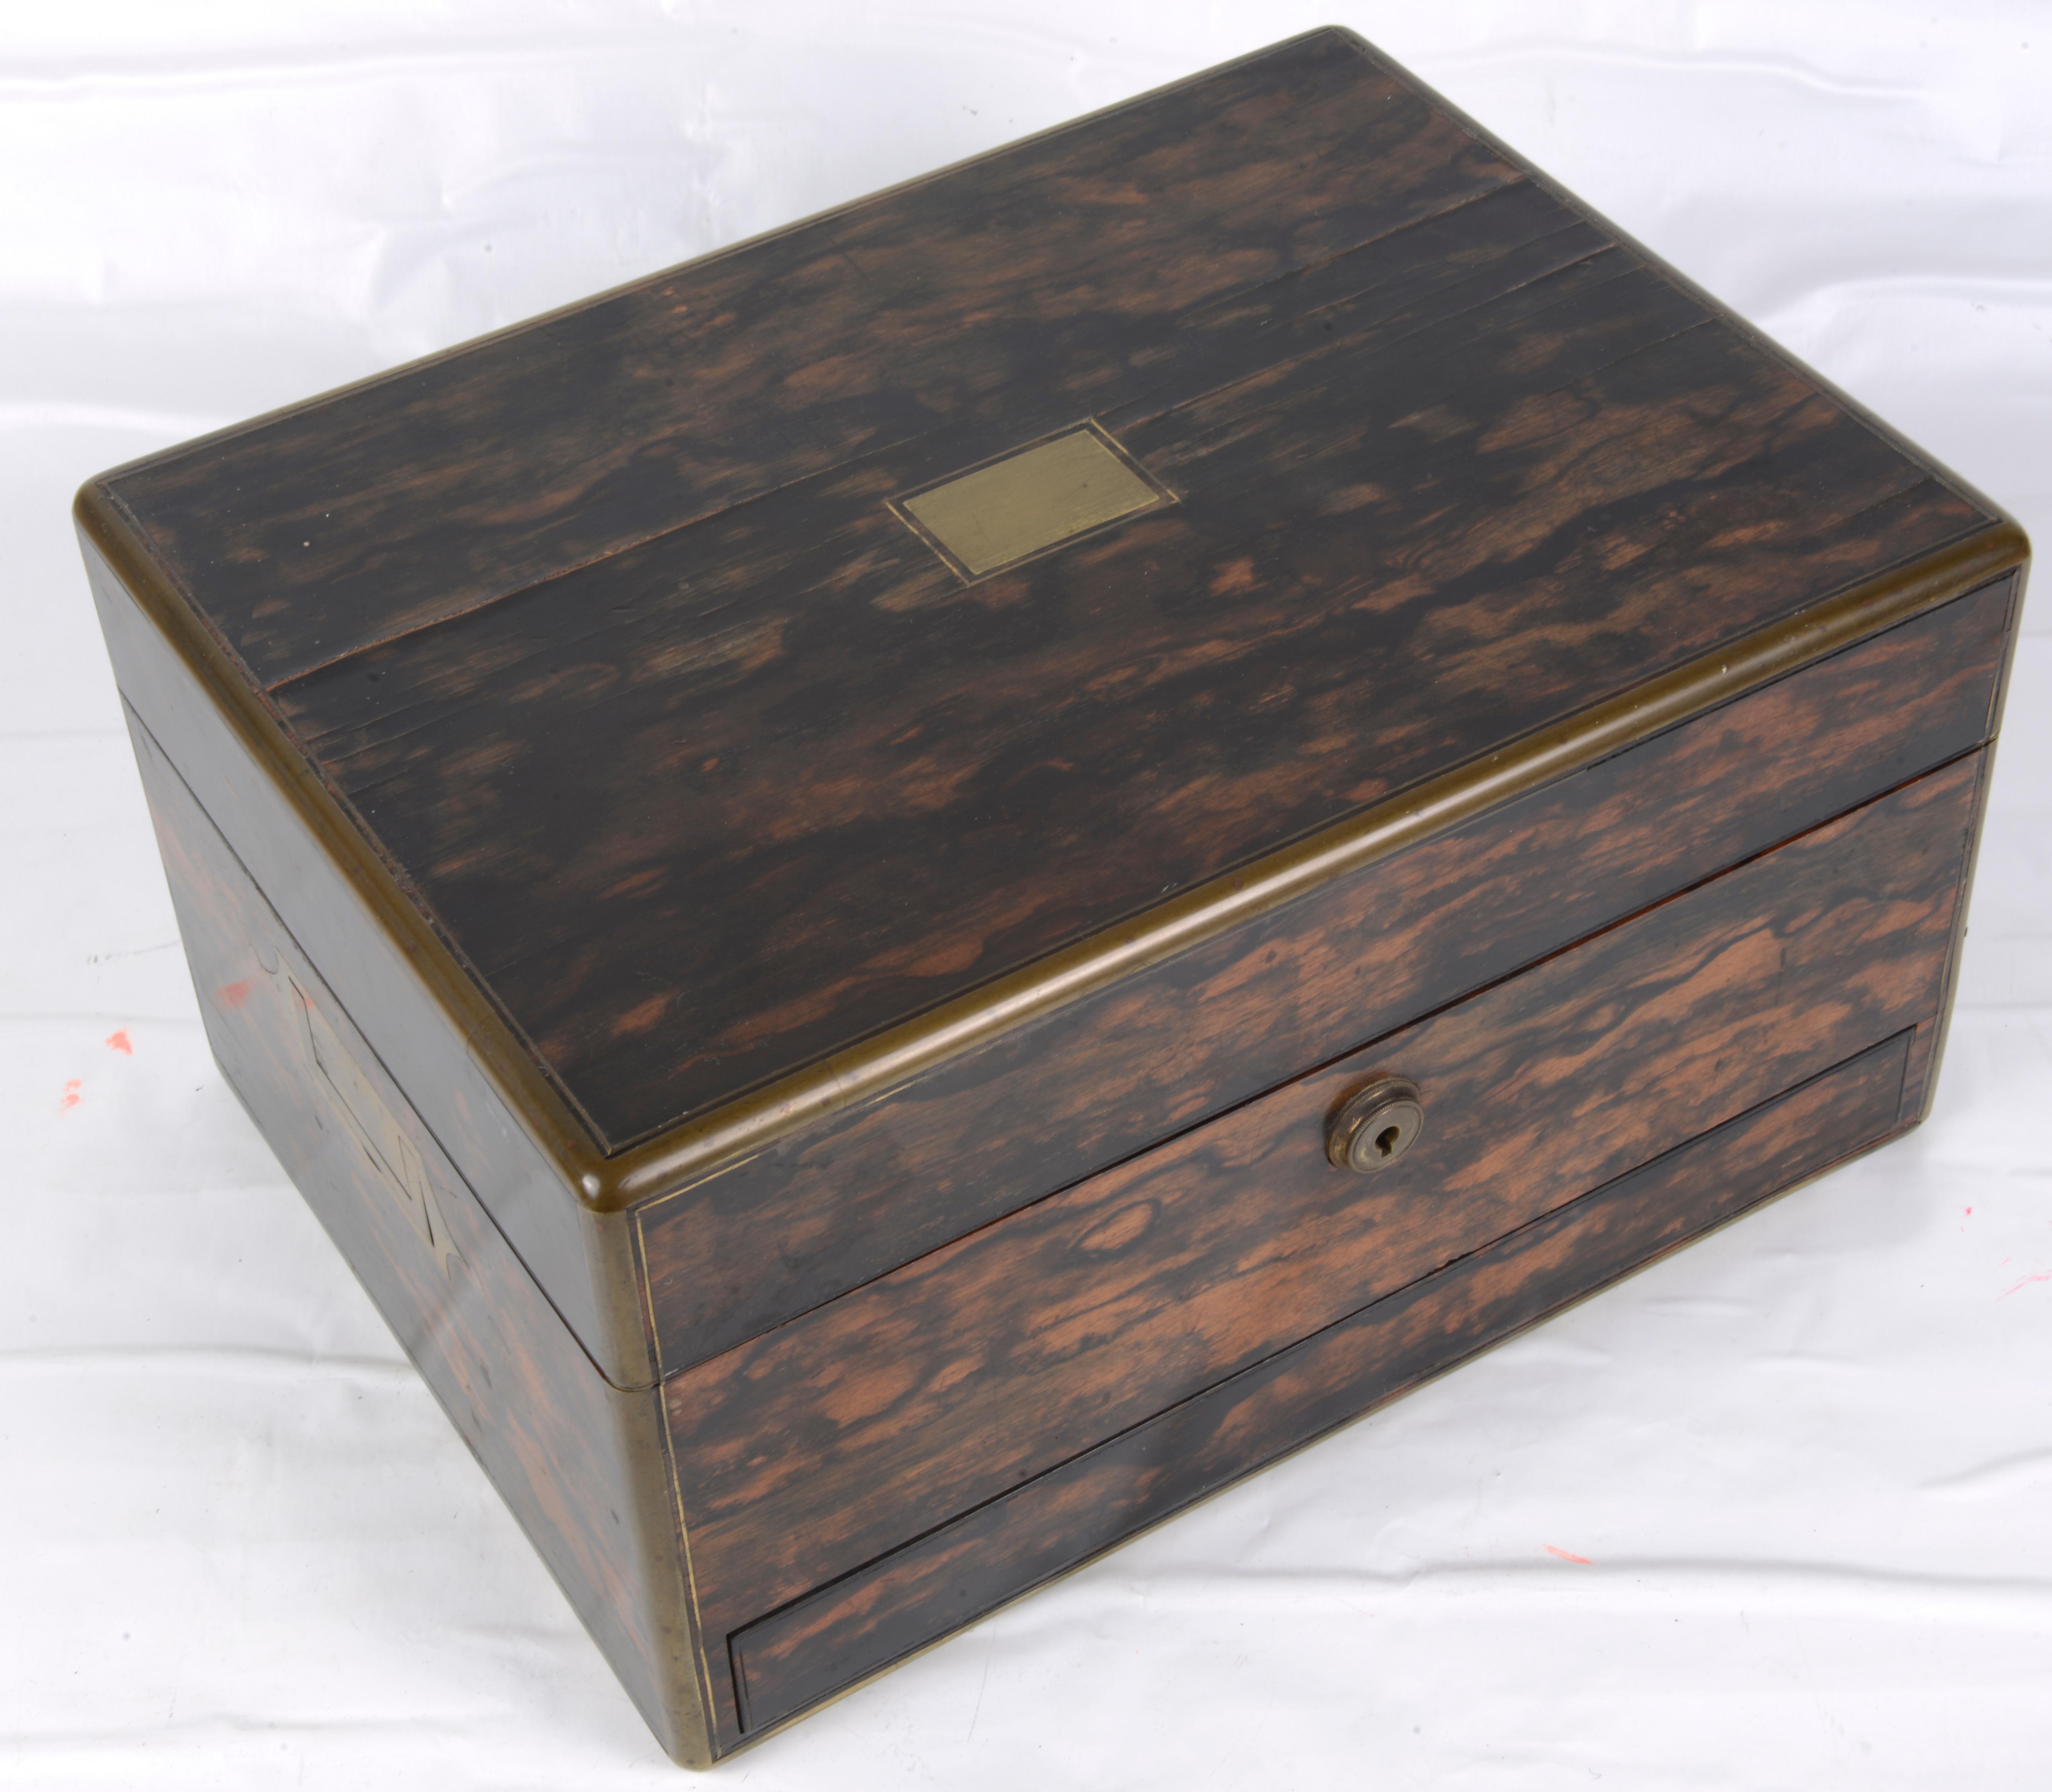 Lot 18 - A Victorian S Mordan & Co. London coromandel dressing table box,